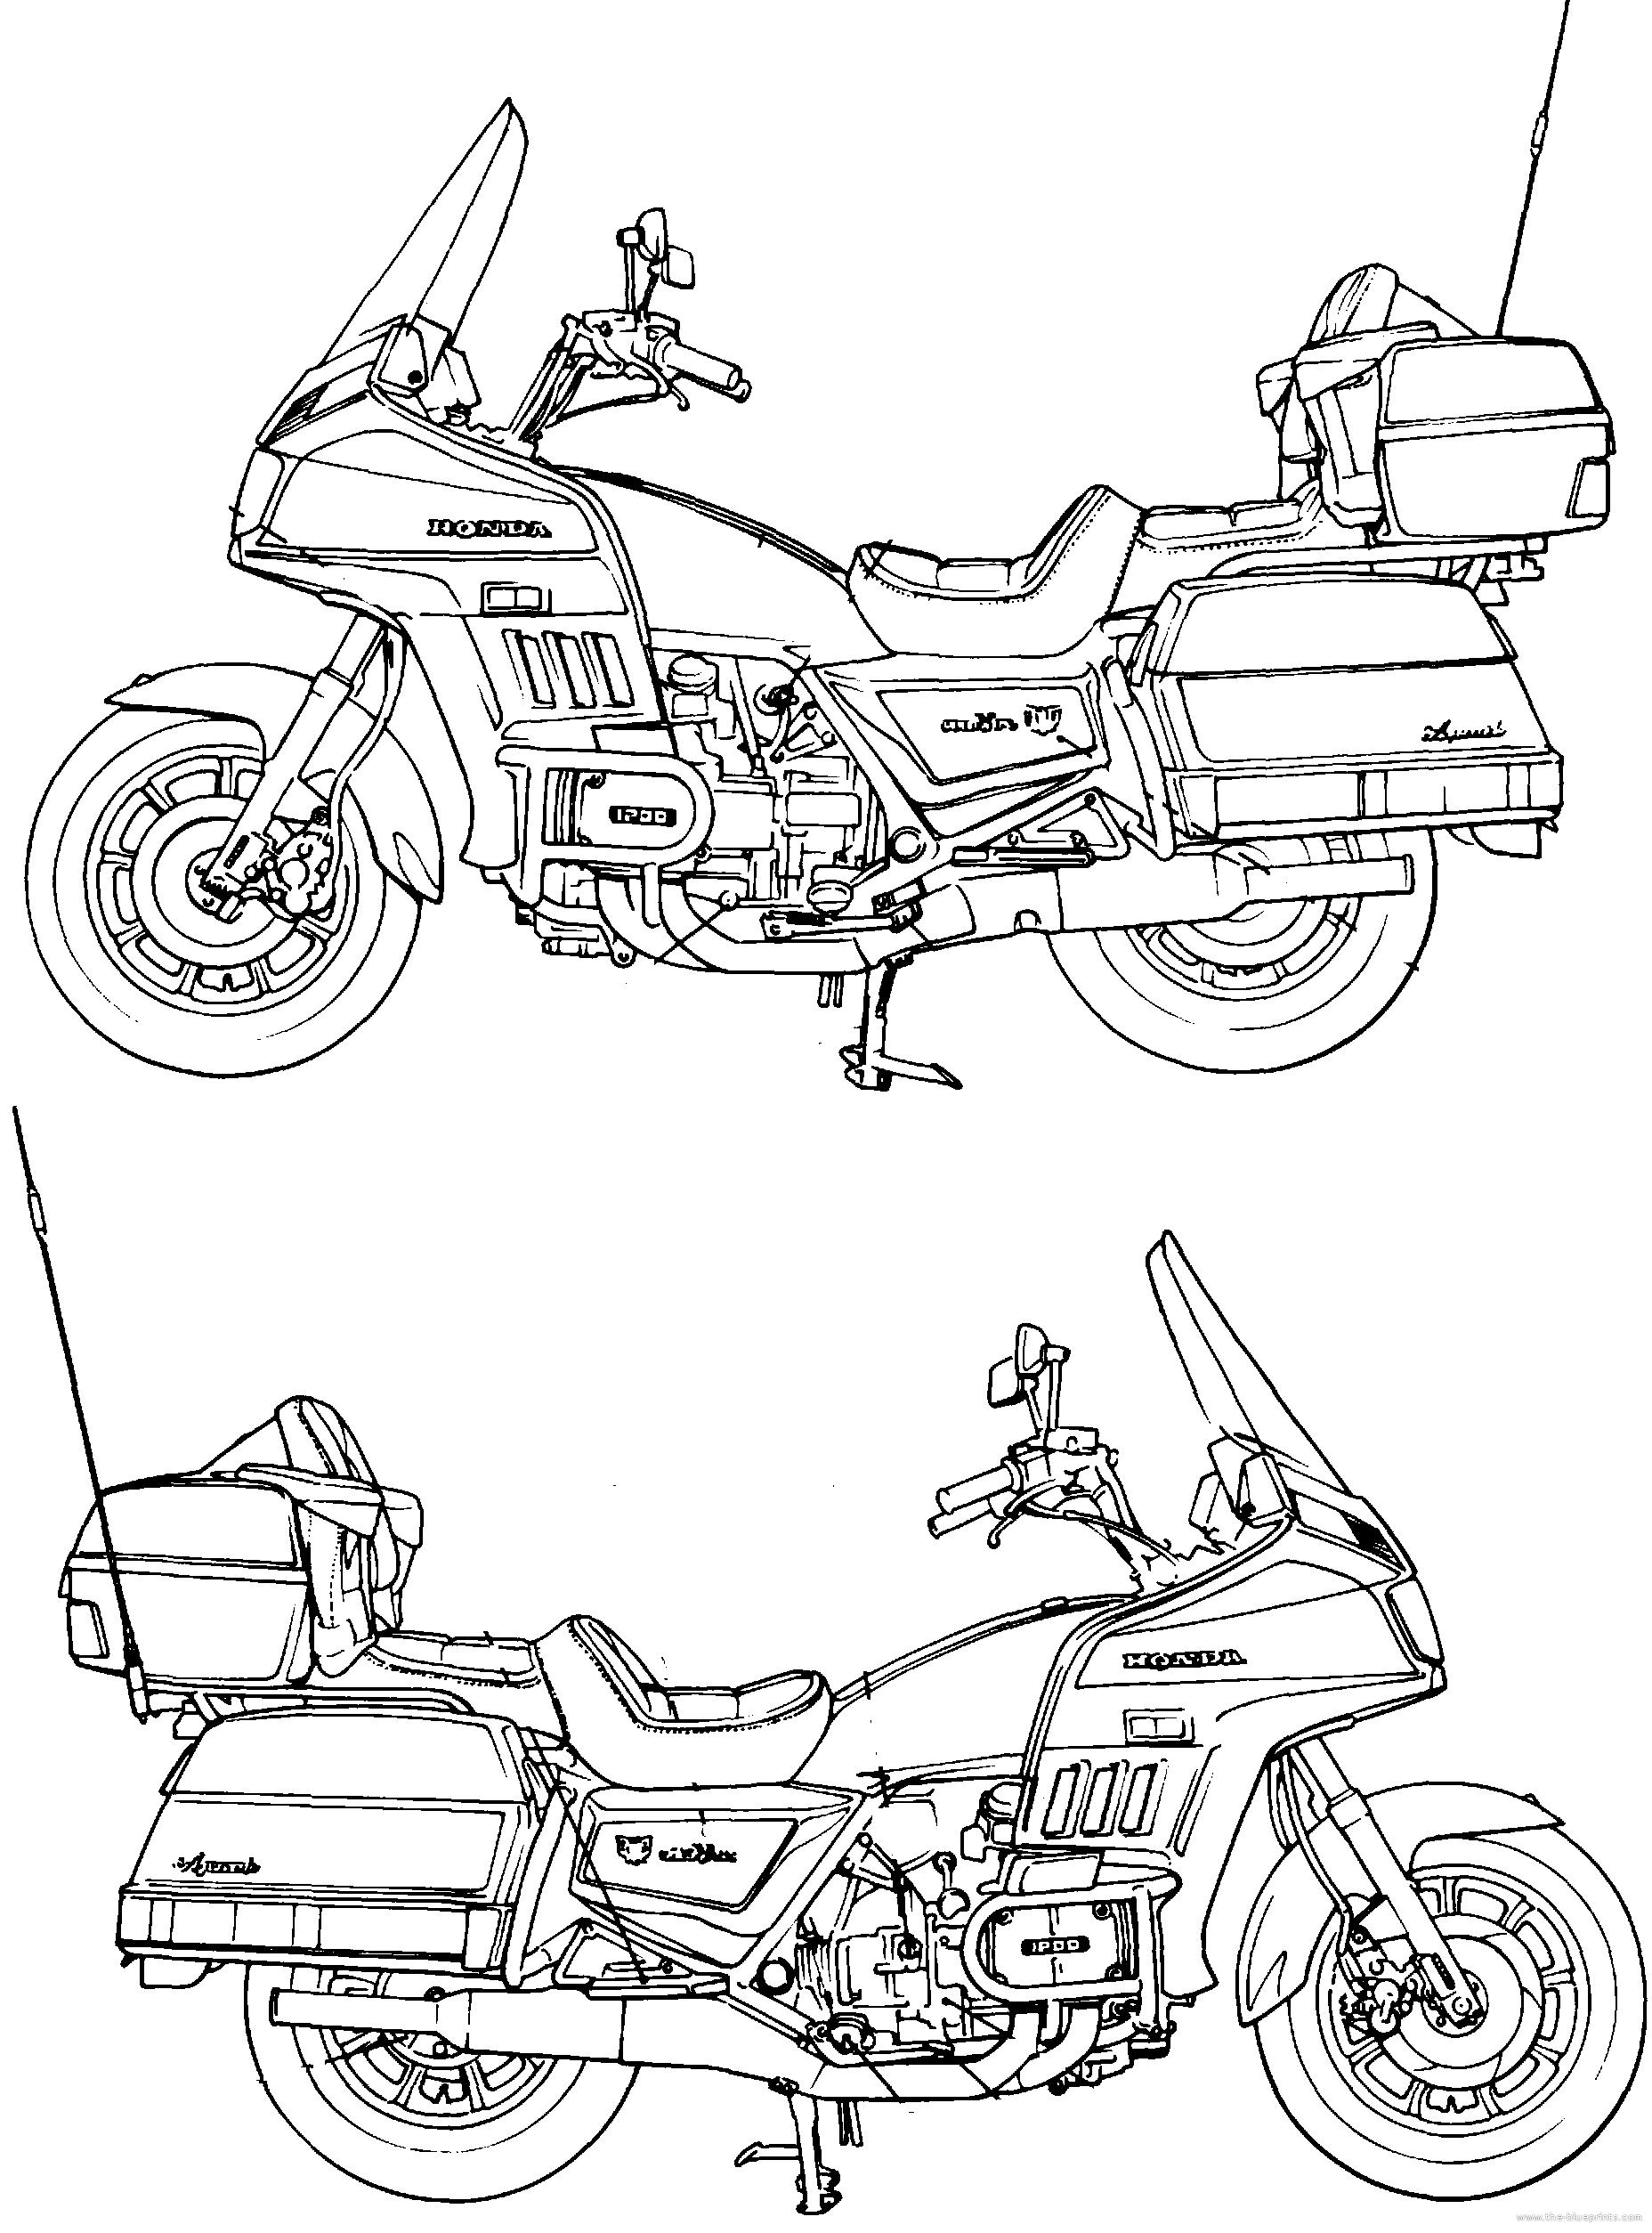 blueprints  u0026gt  motorcycles  u0026gt  honda  u0026gt  honda goldwing gl1200